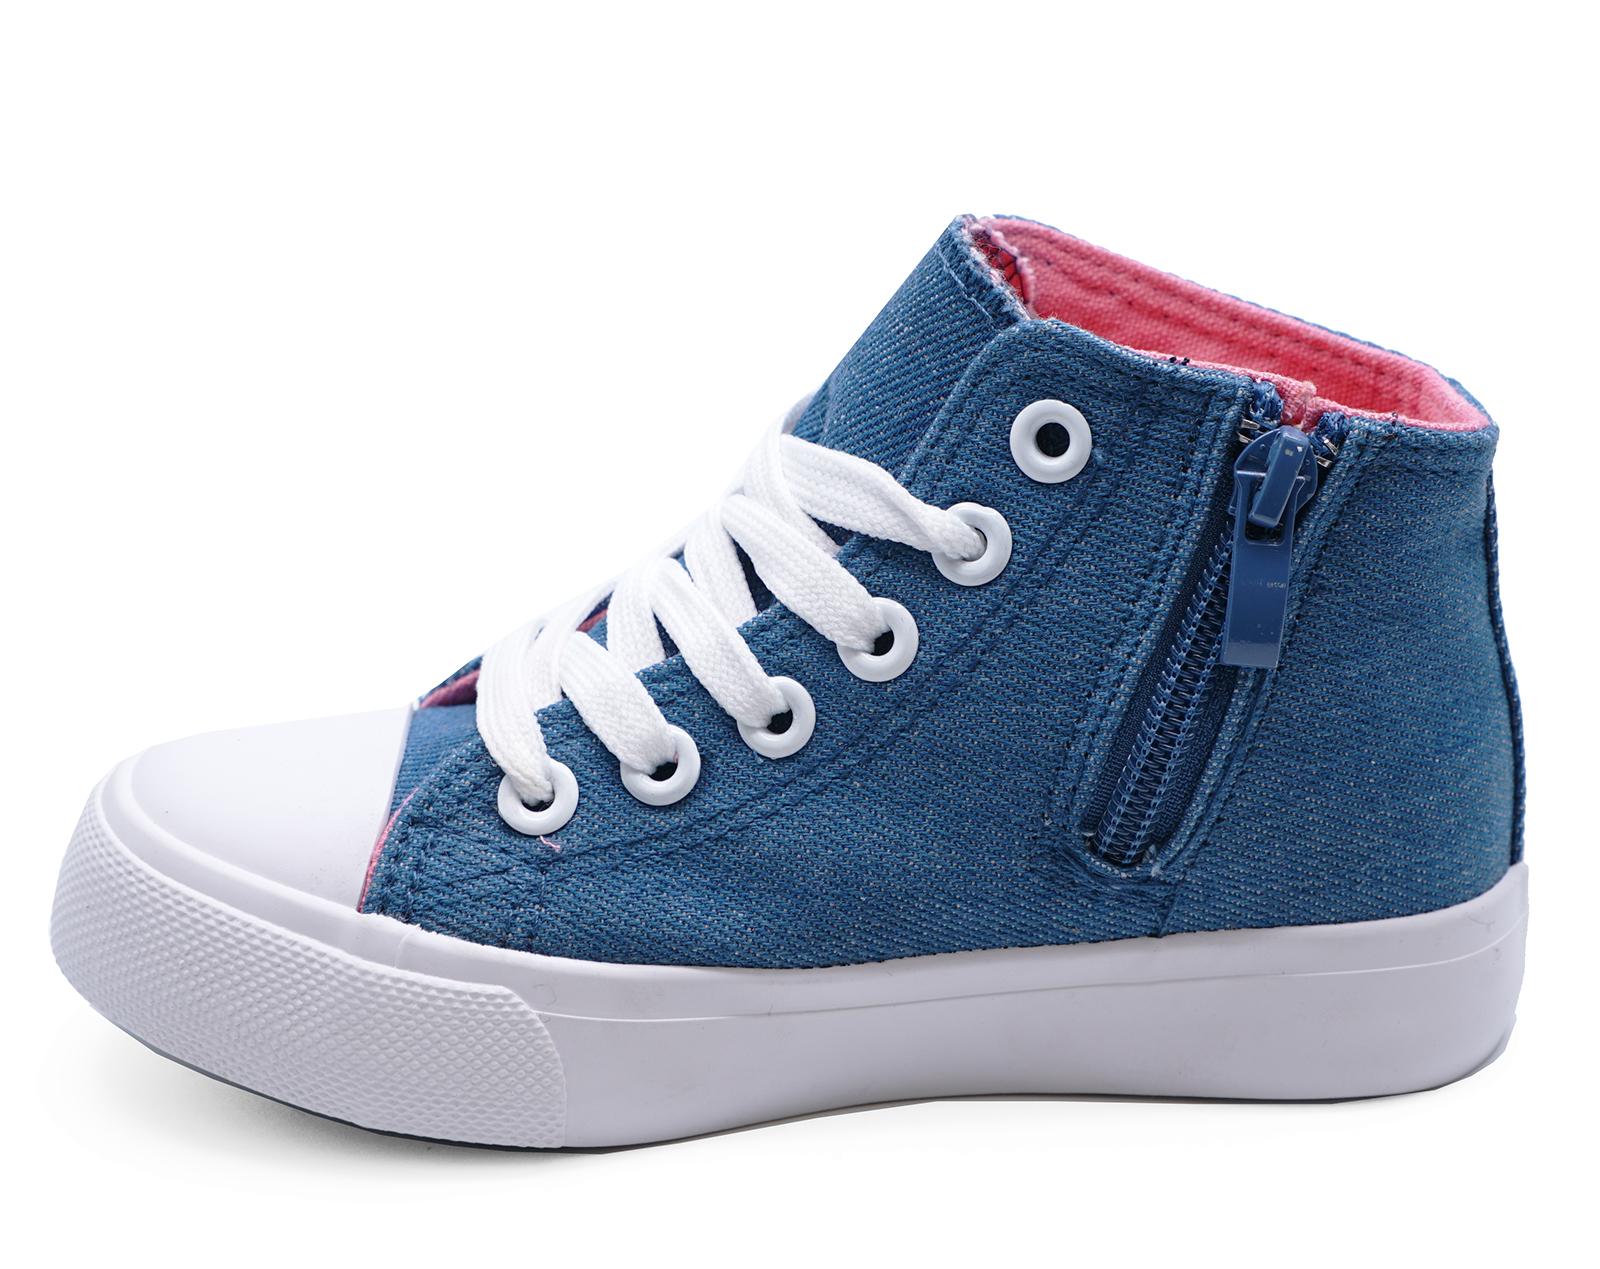 Ninos-Ninas-Lona-Azul-Tobillo-Zapatillas-Tipo-Botin-Botas-Zapatillas-3-2